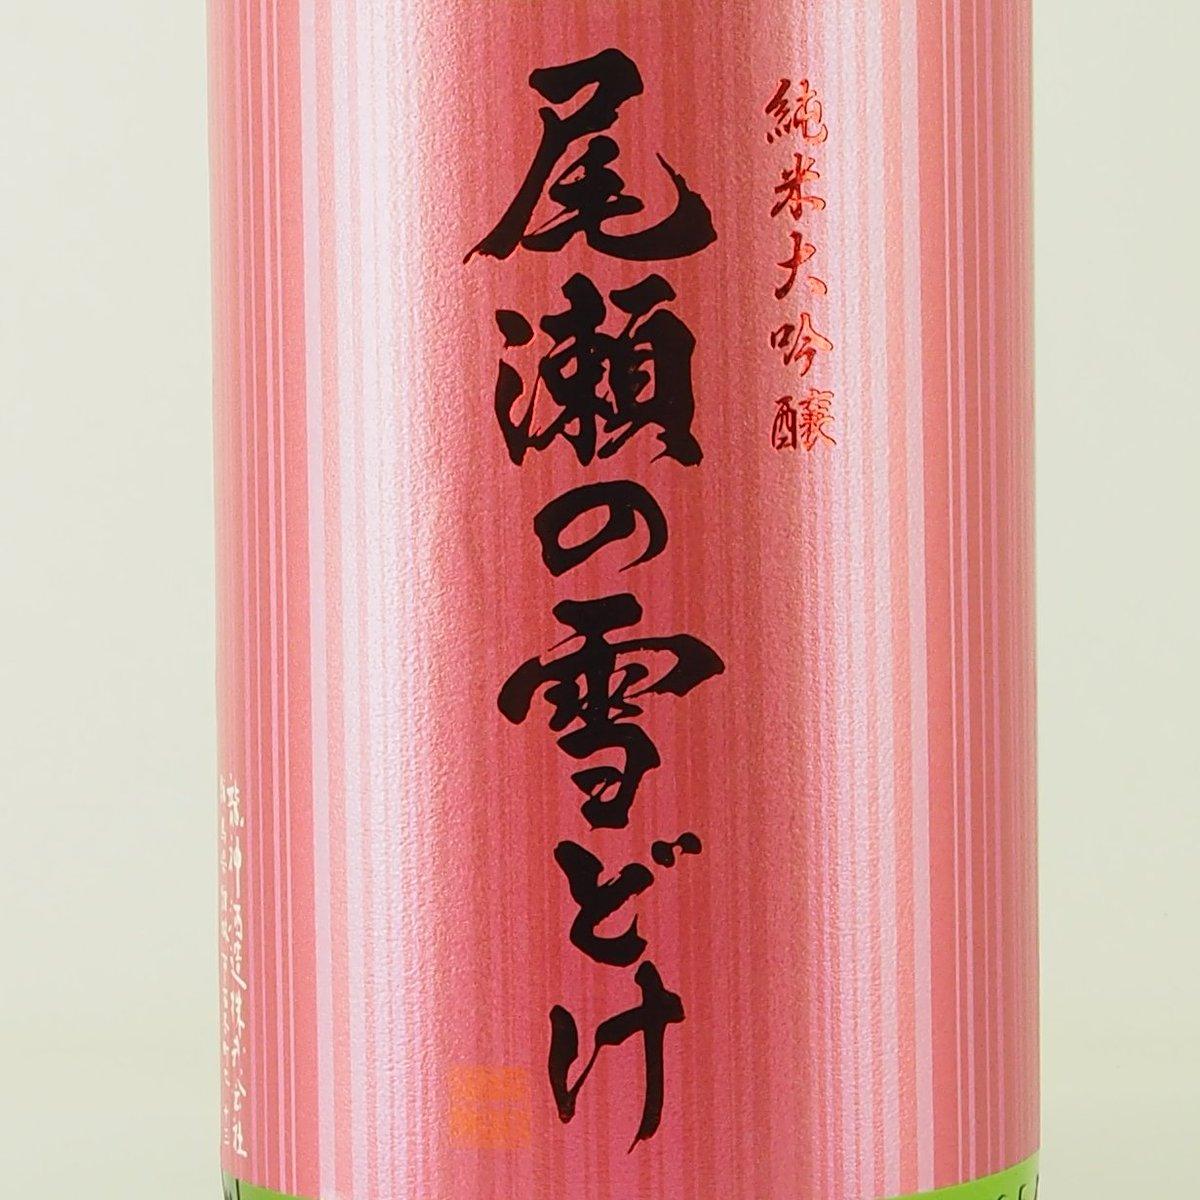 test ツイッターメディア - 【日本酒】 尾瀬の雪どけ 純米大吟醸 初しぼり 入荷致しました!  ※10/22(金)午後店頭販売開始予定  林檎や洋ナシを想わせる華やかな香りと 甘味に柔らかな酸が特徴です。  詳しくはブログで! https://t.co/02oGEMgqVr オンラインショップ https://t.co/KQcGl5IAYd https://t.co/Iw3ZMDnxjS